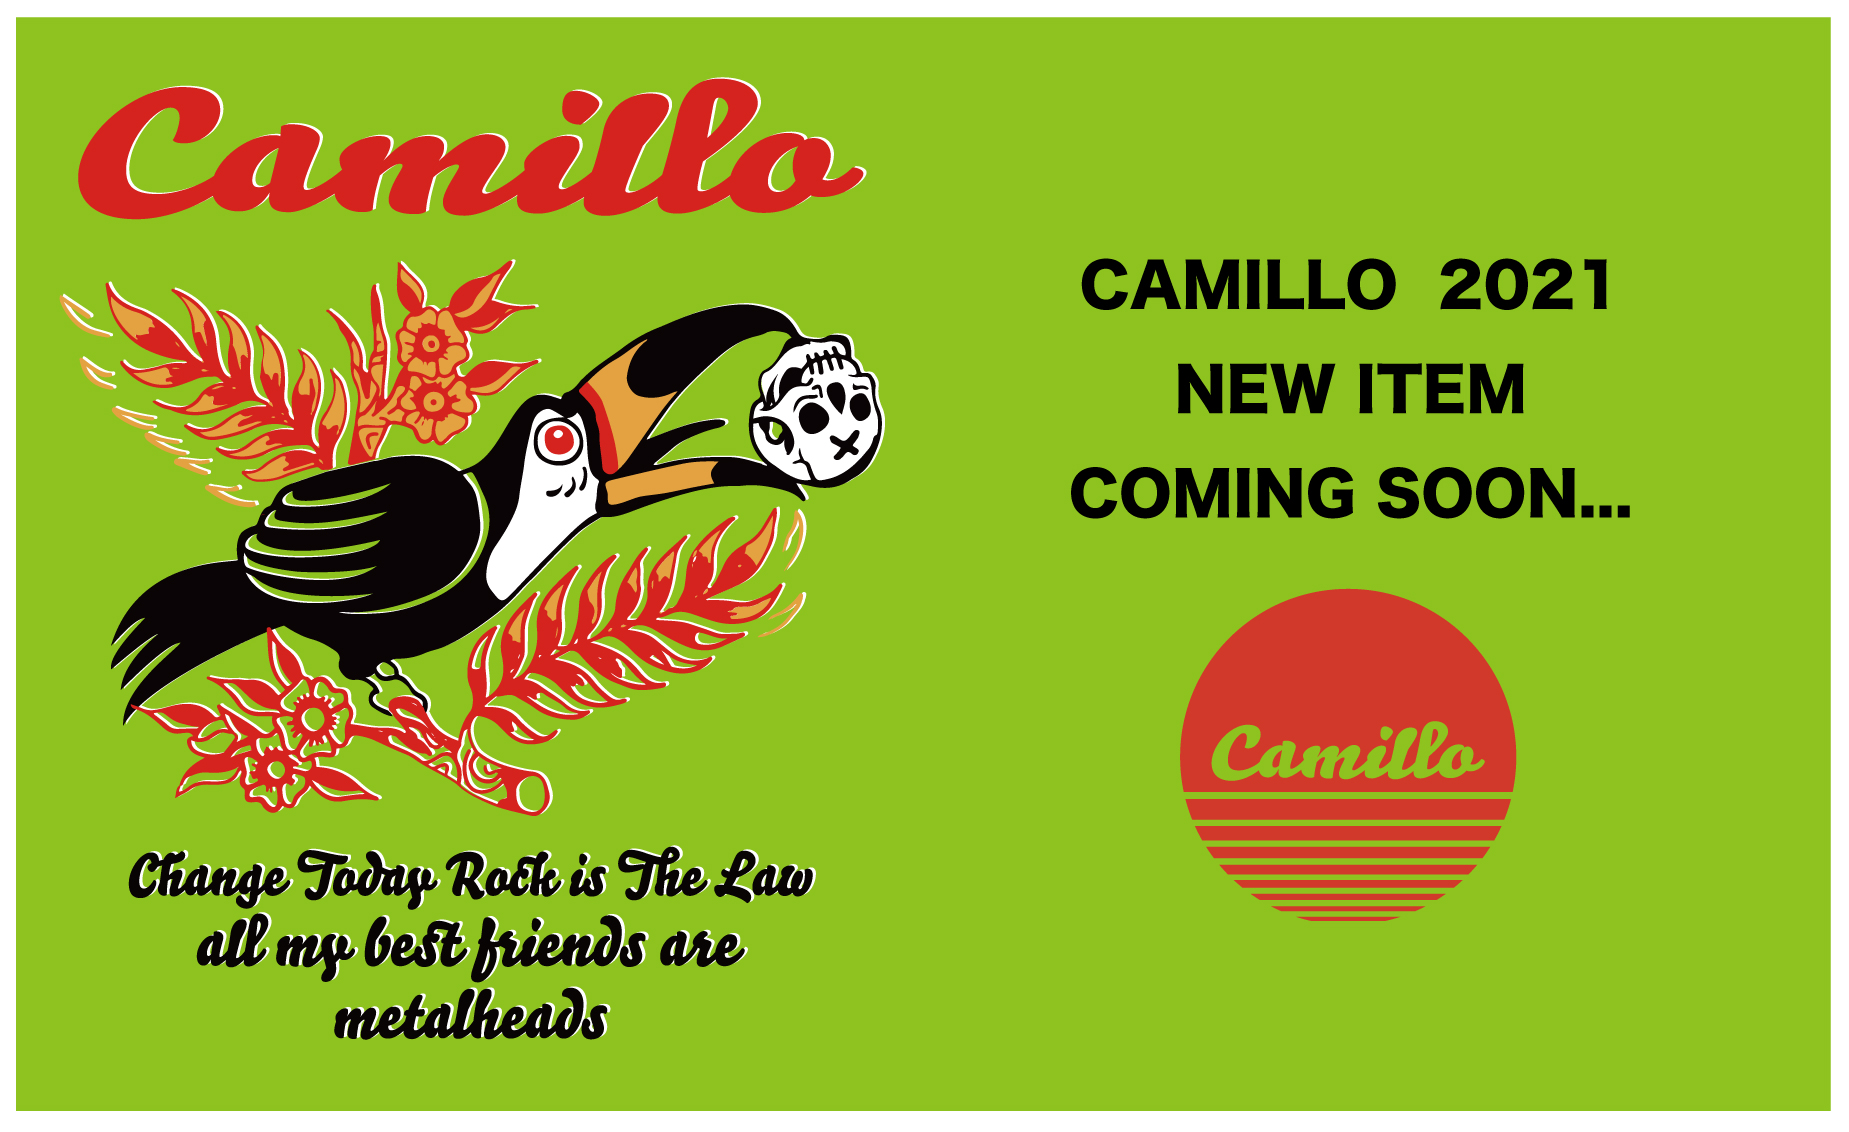 2021 CAMILLO NEW ITEM